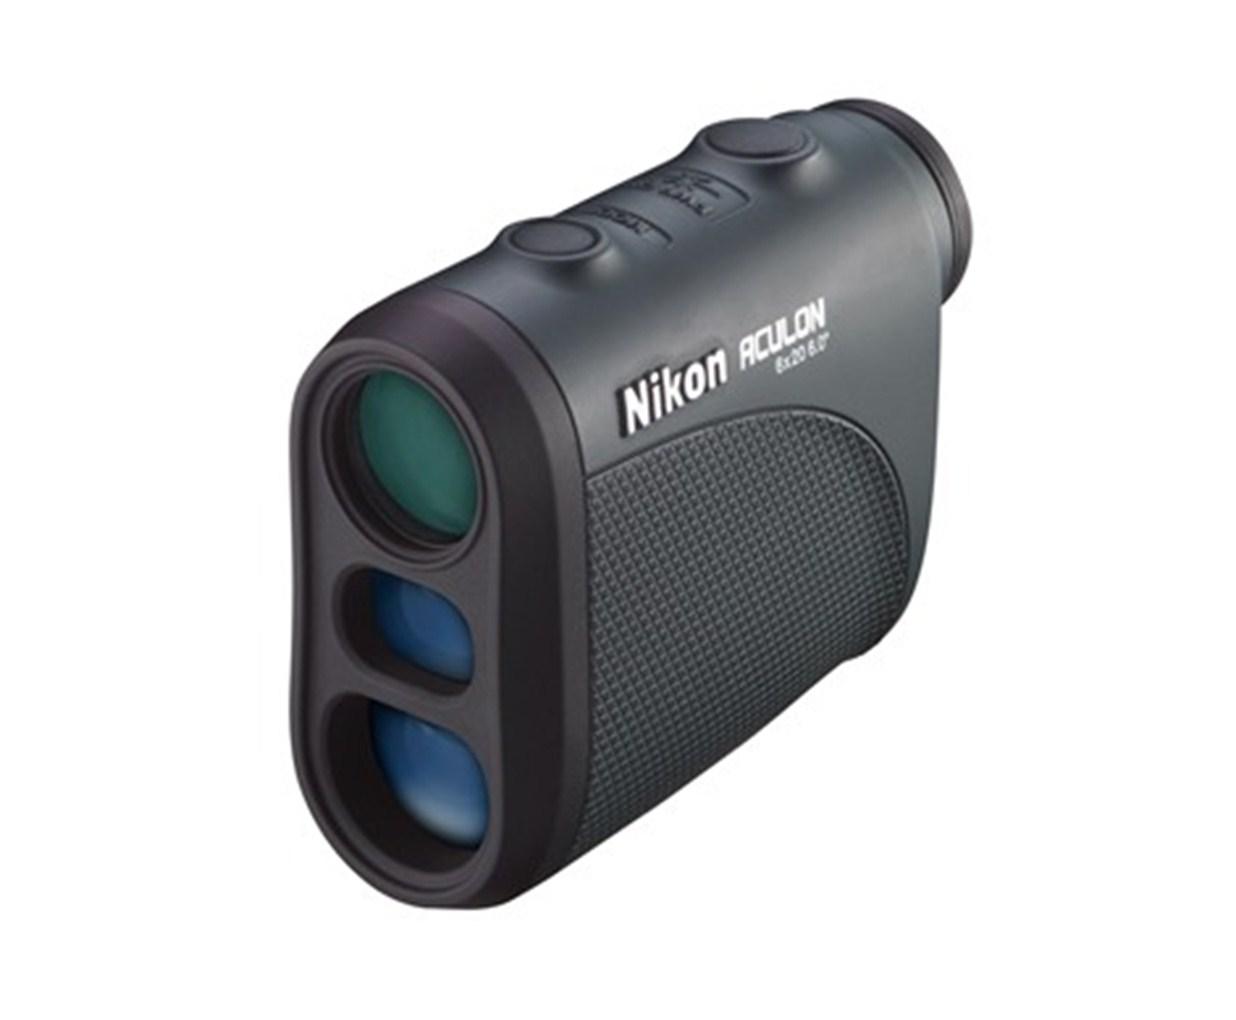 Nikon Aculon Laser Rangefinder NIK8397